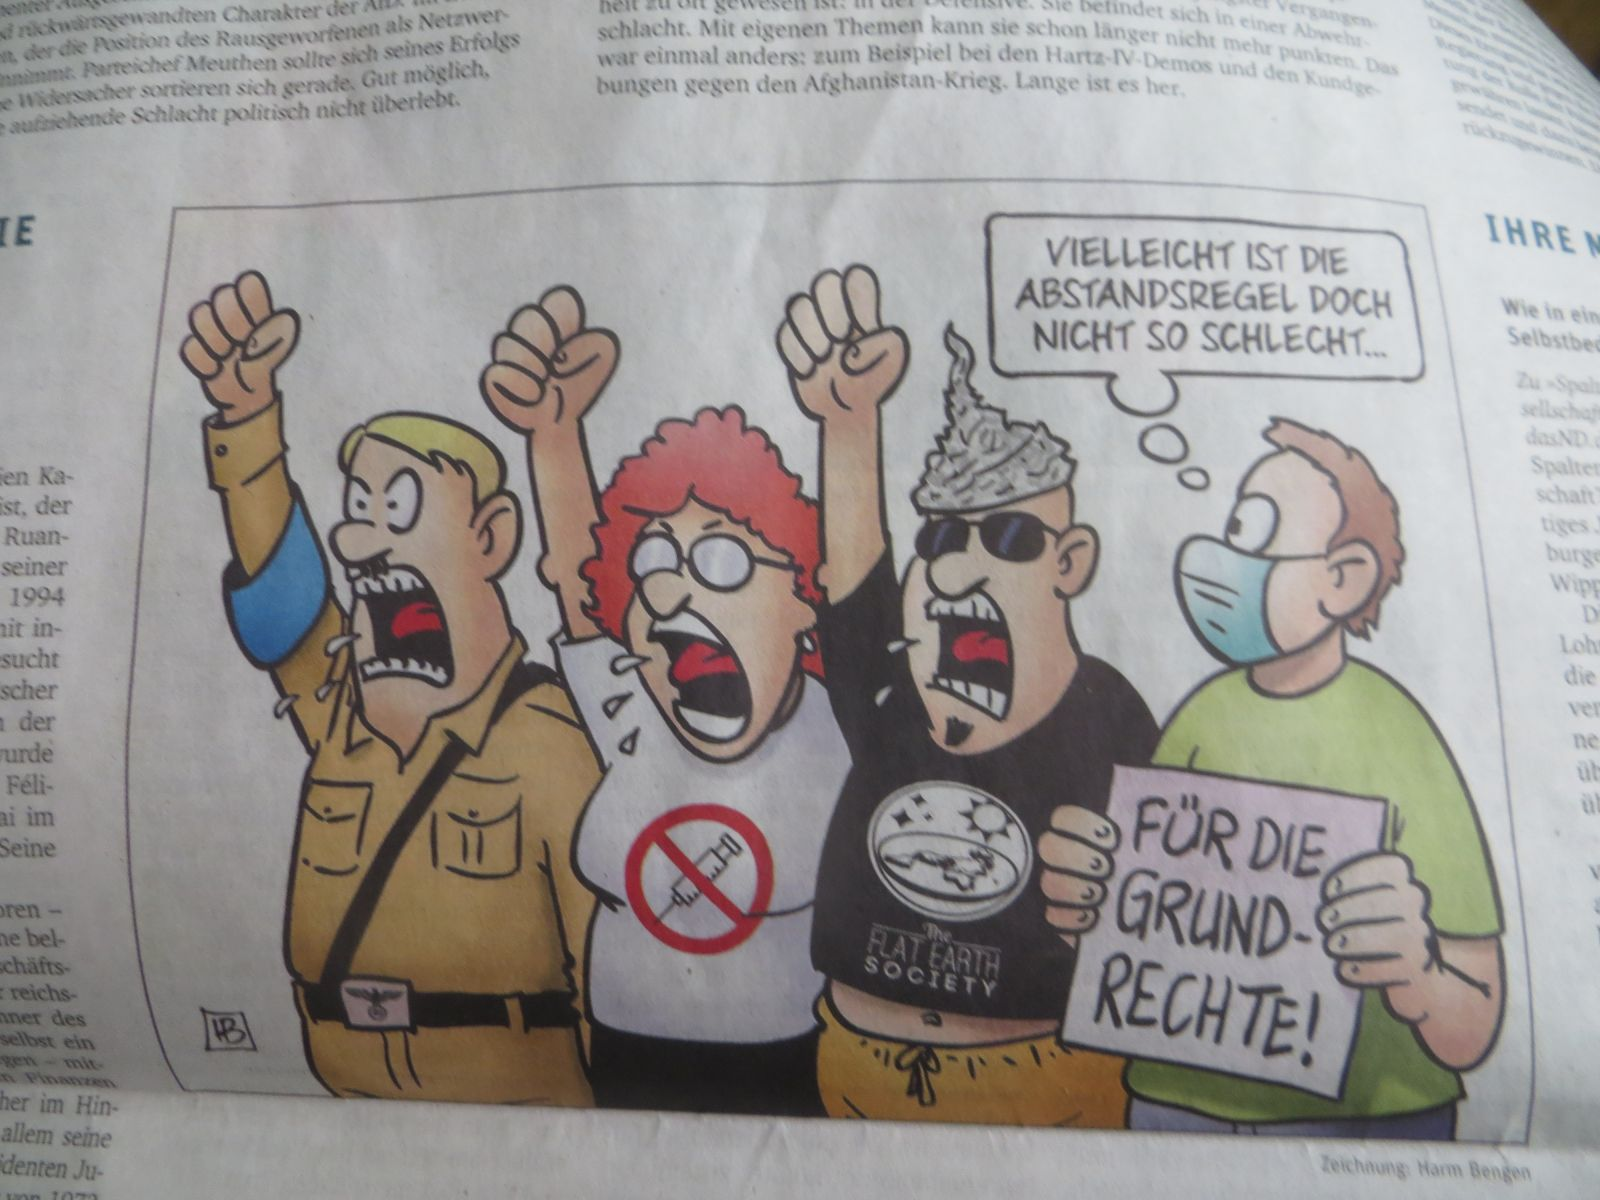 CDU Beratung durch Dietmar Moews - featured image